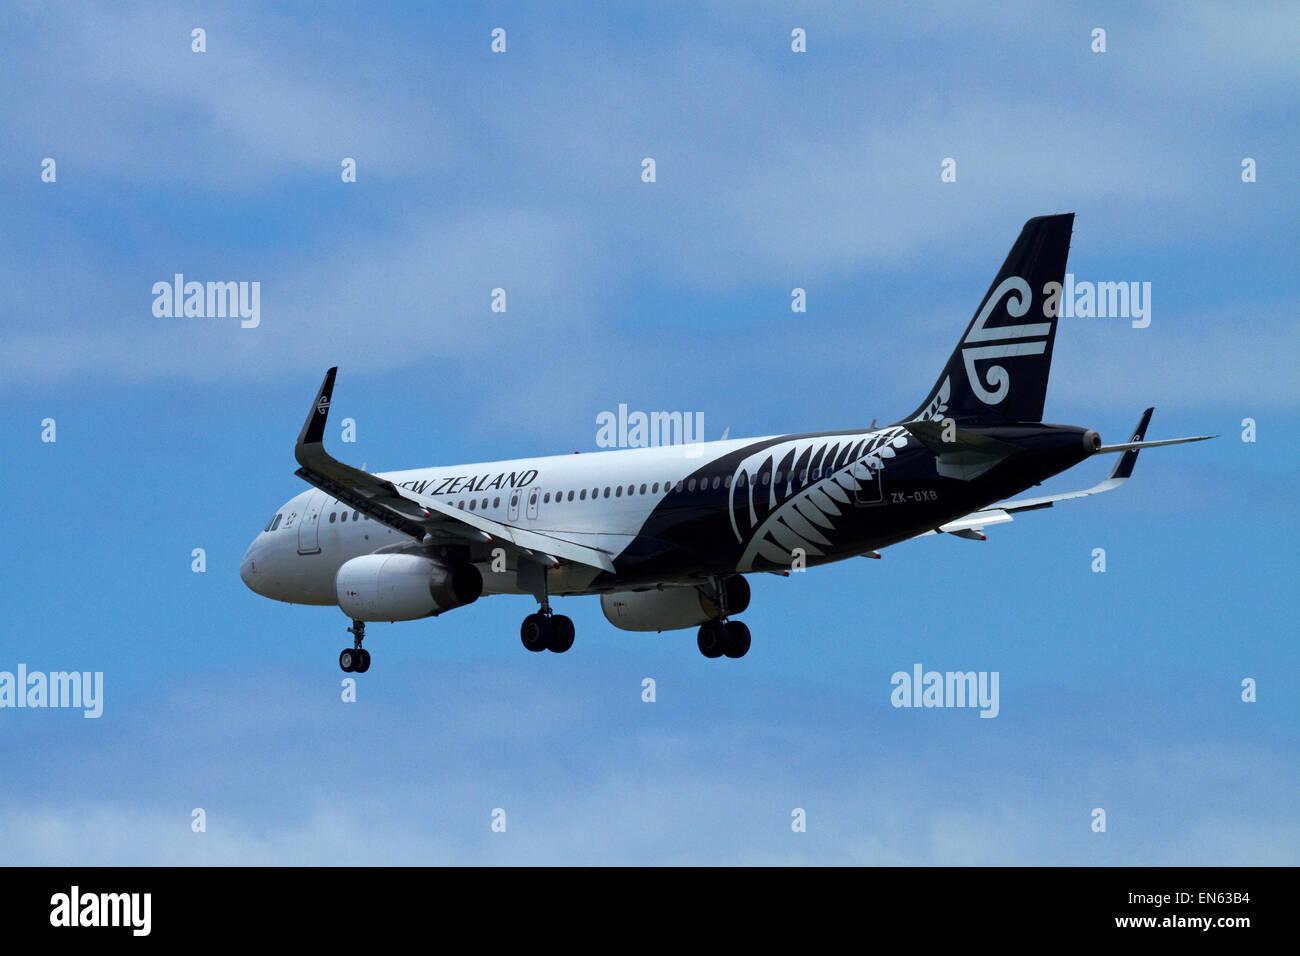 Air New Zealand Airbus A320-200 landing at Wellington International Airport, Wellington, North Island, New Zealand - Stock Image